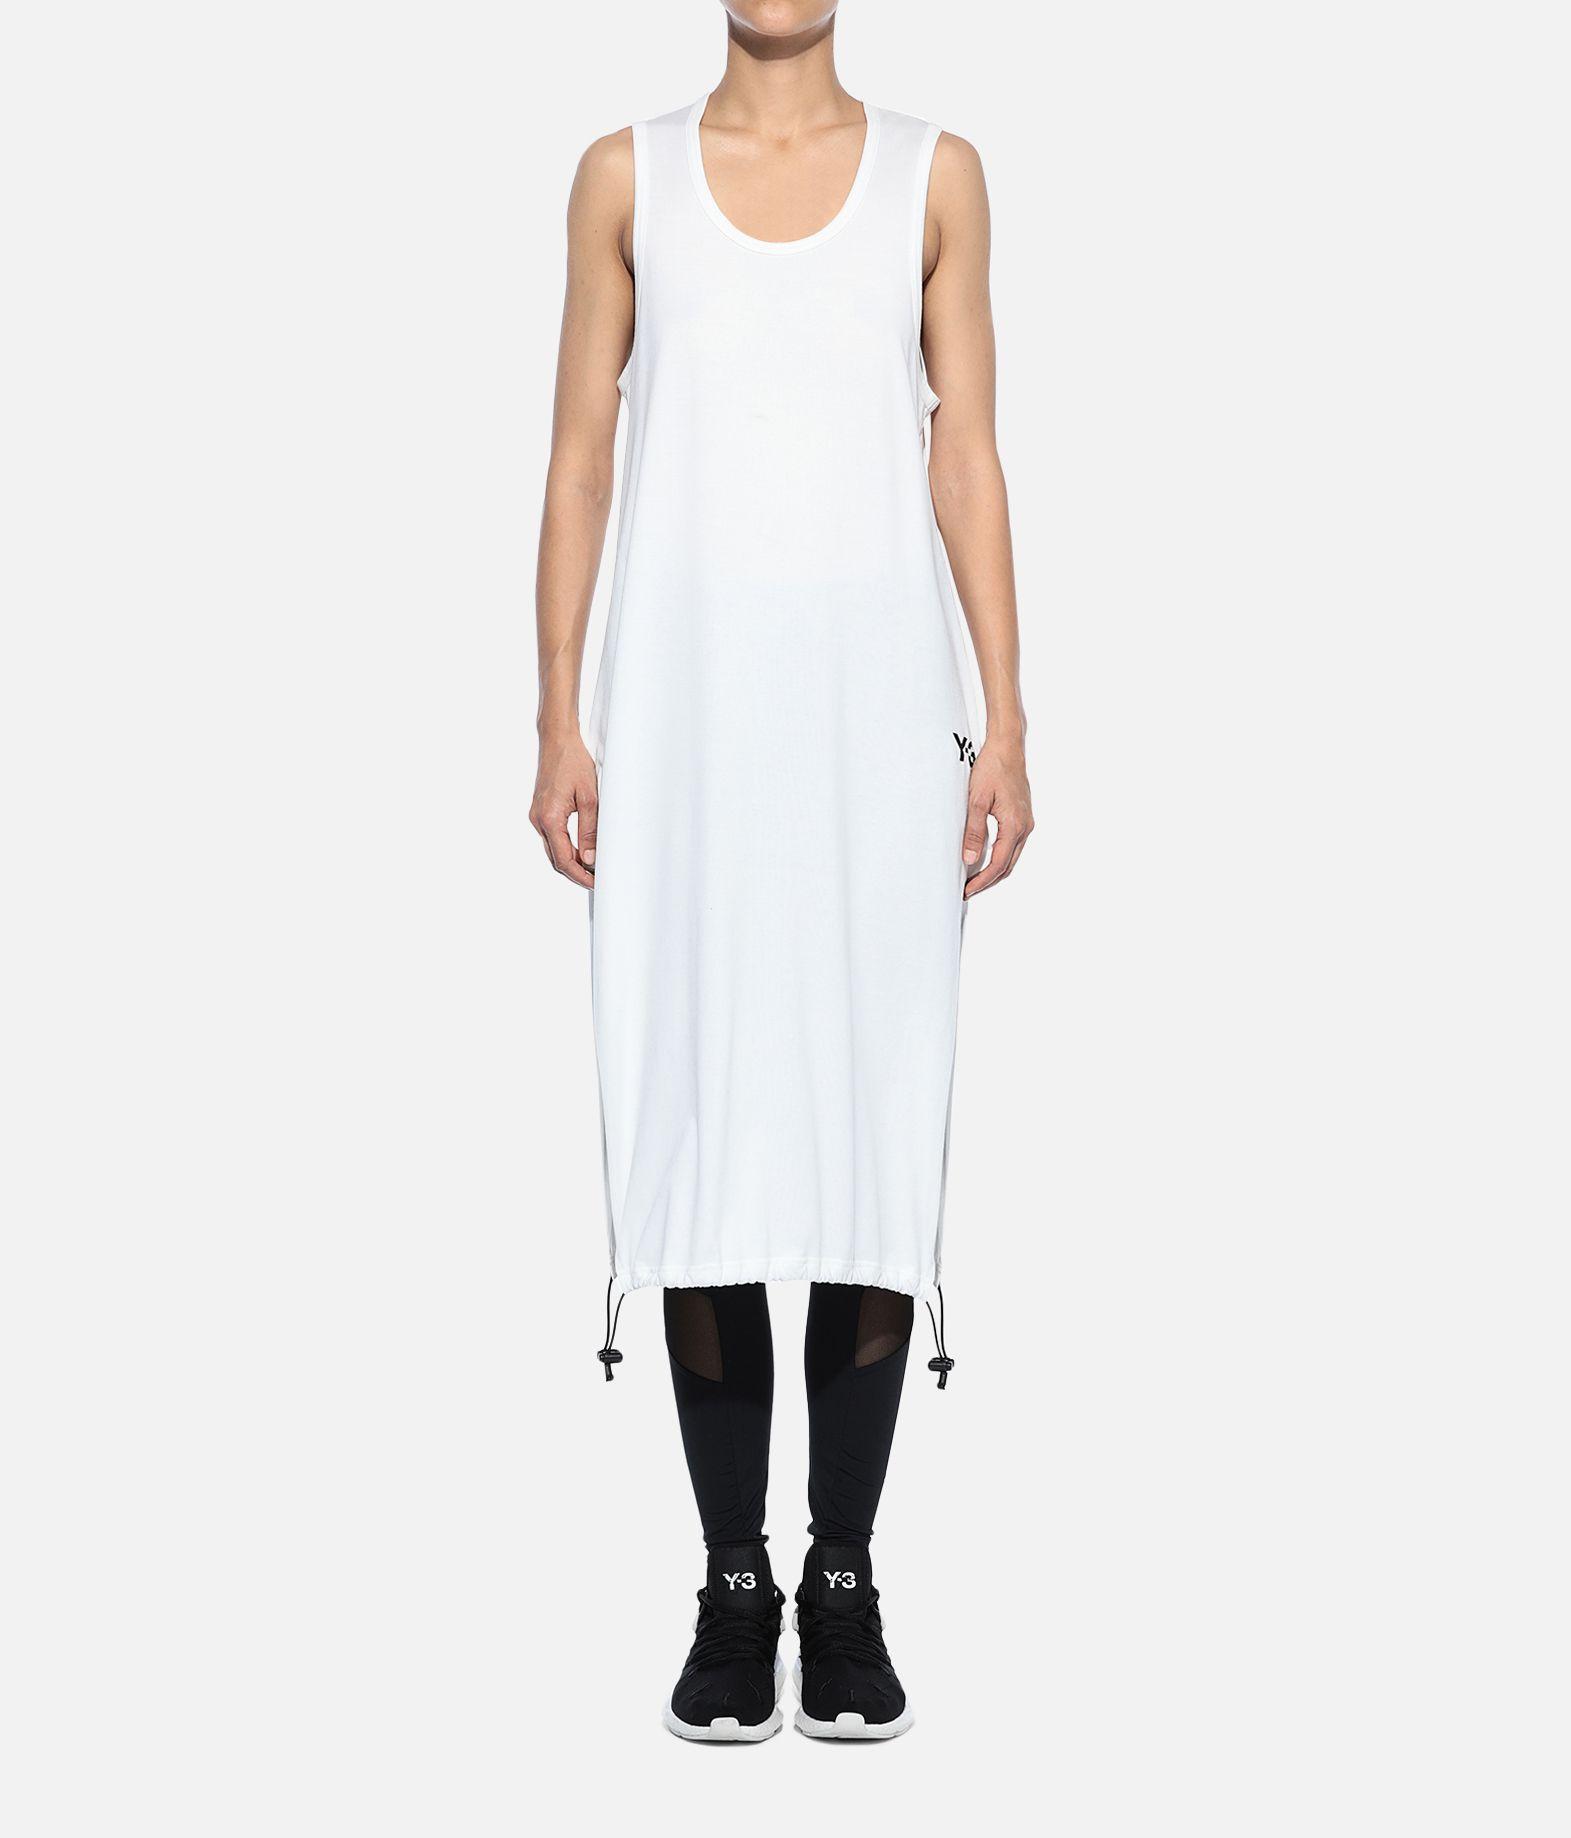 Y-3 Y-3 Drawstring Long Tank Top Sleeveless t-shirt Woman r